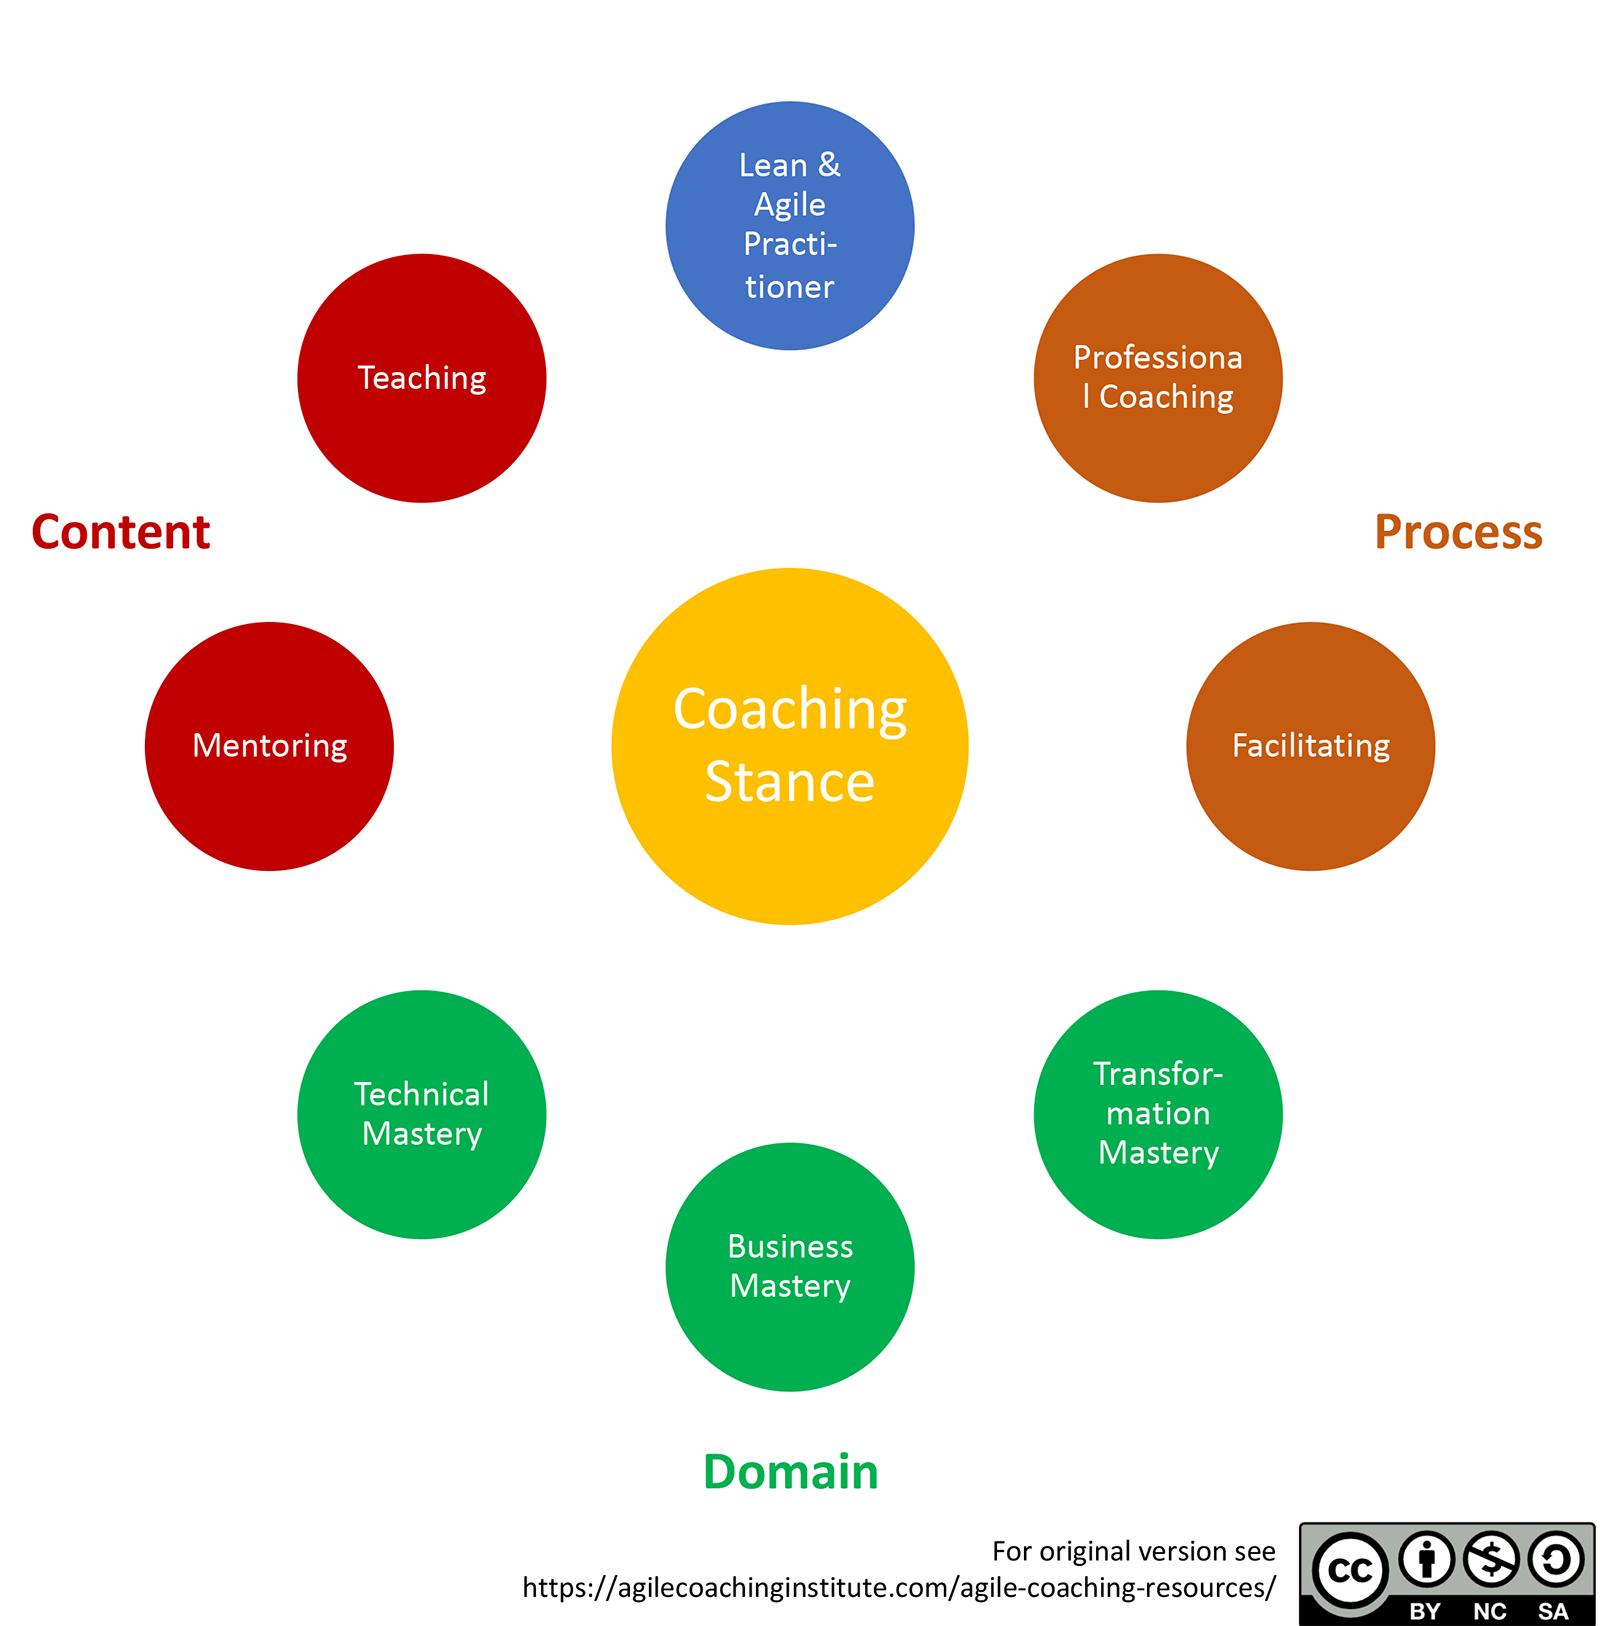 Agile Coaching Competencies Framework nach Spayde und Adkins.